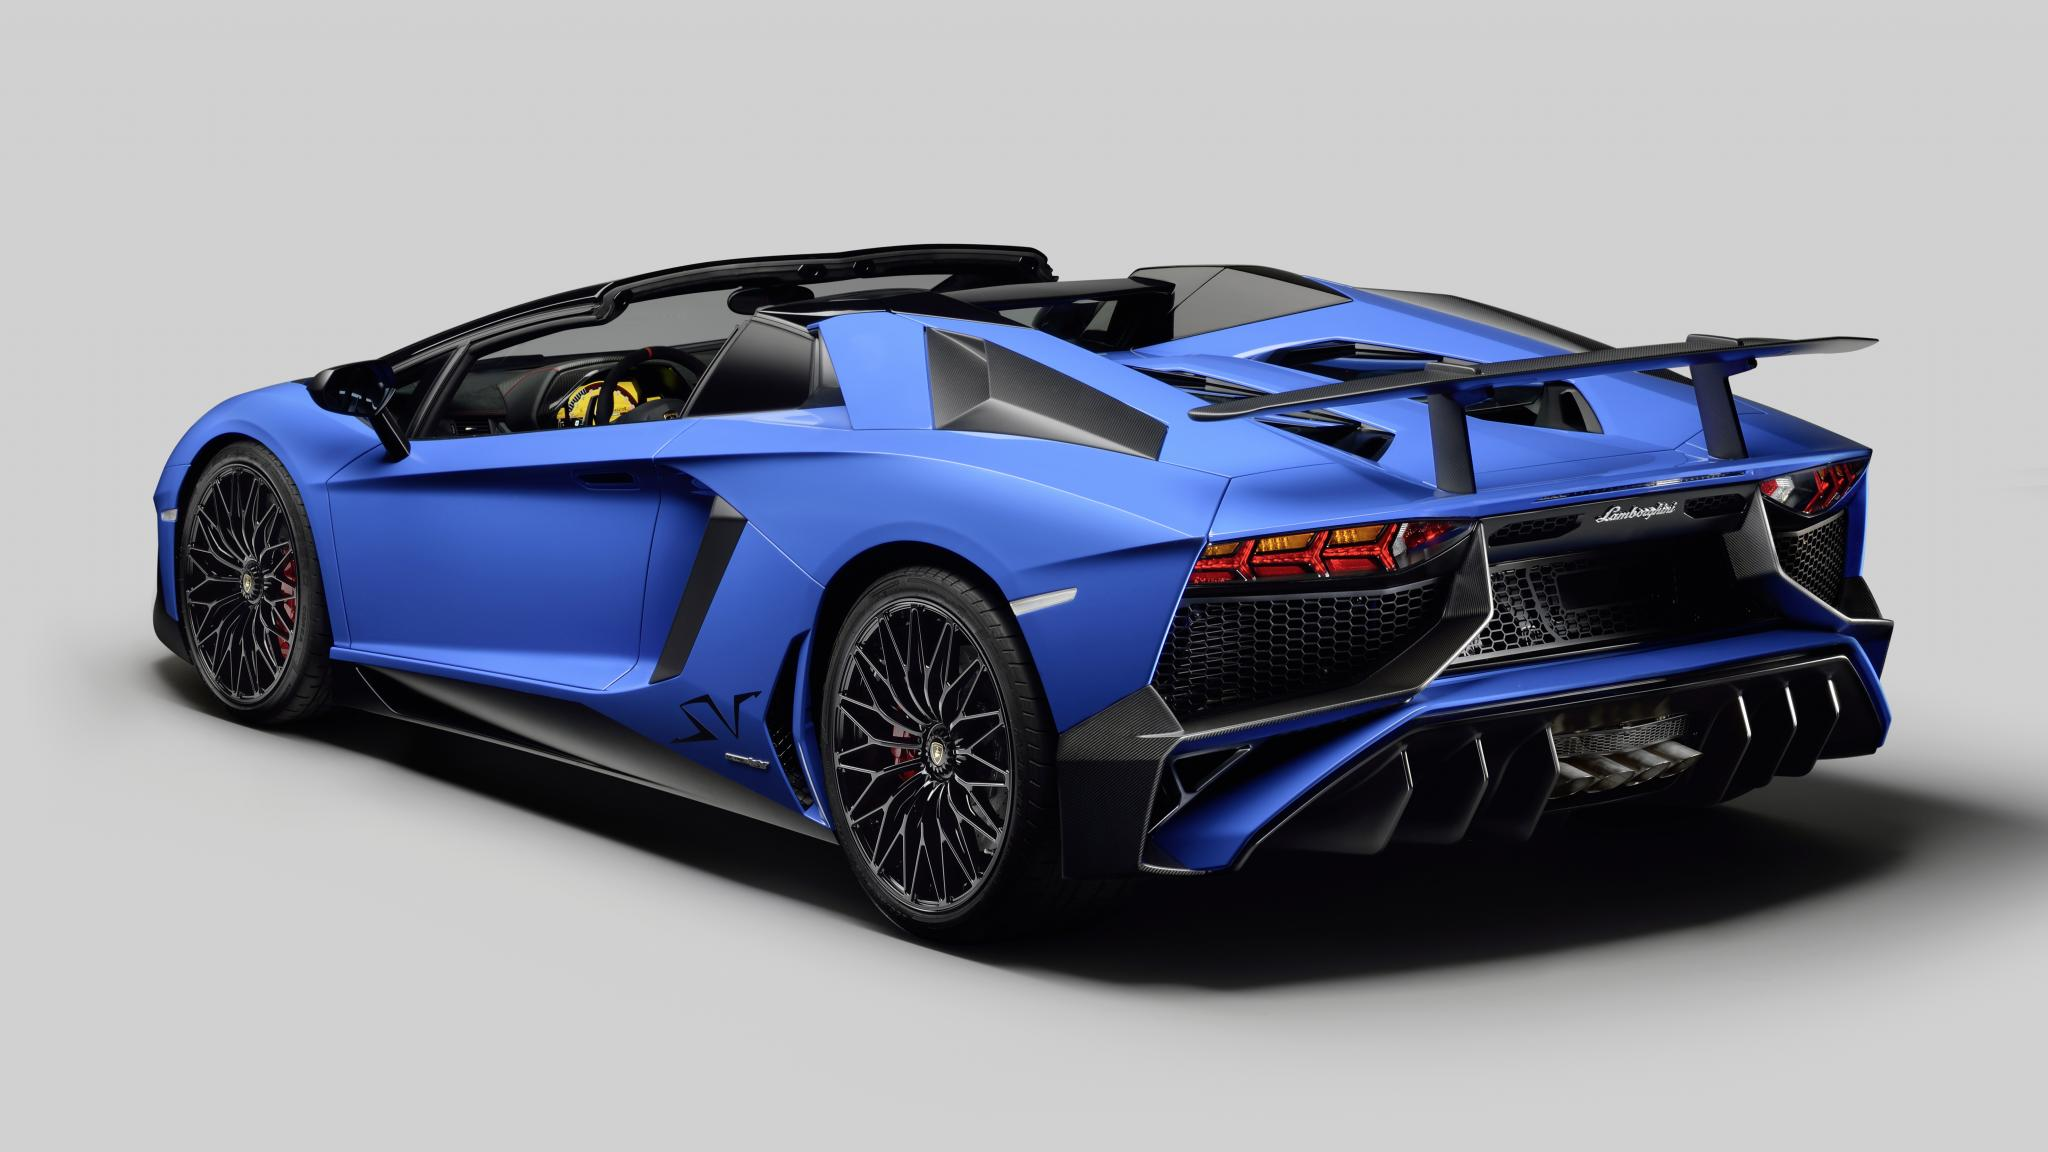 Lamborghini-AventadorSV-Roadster-3